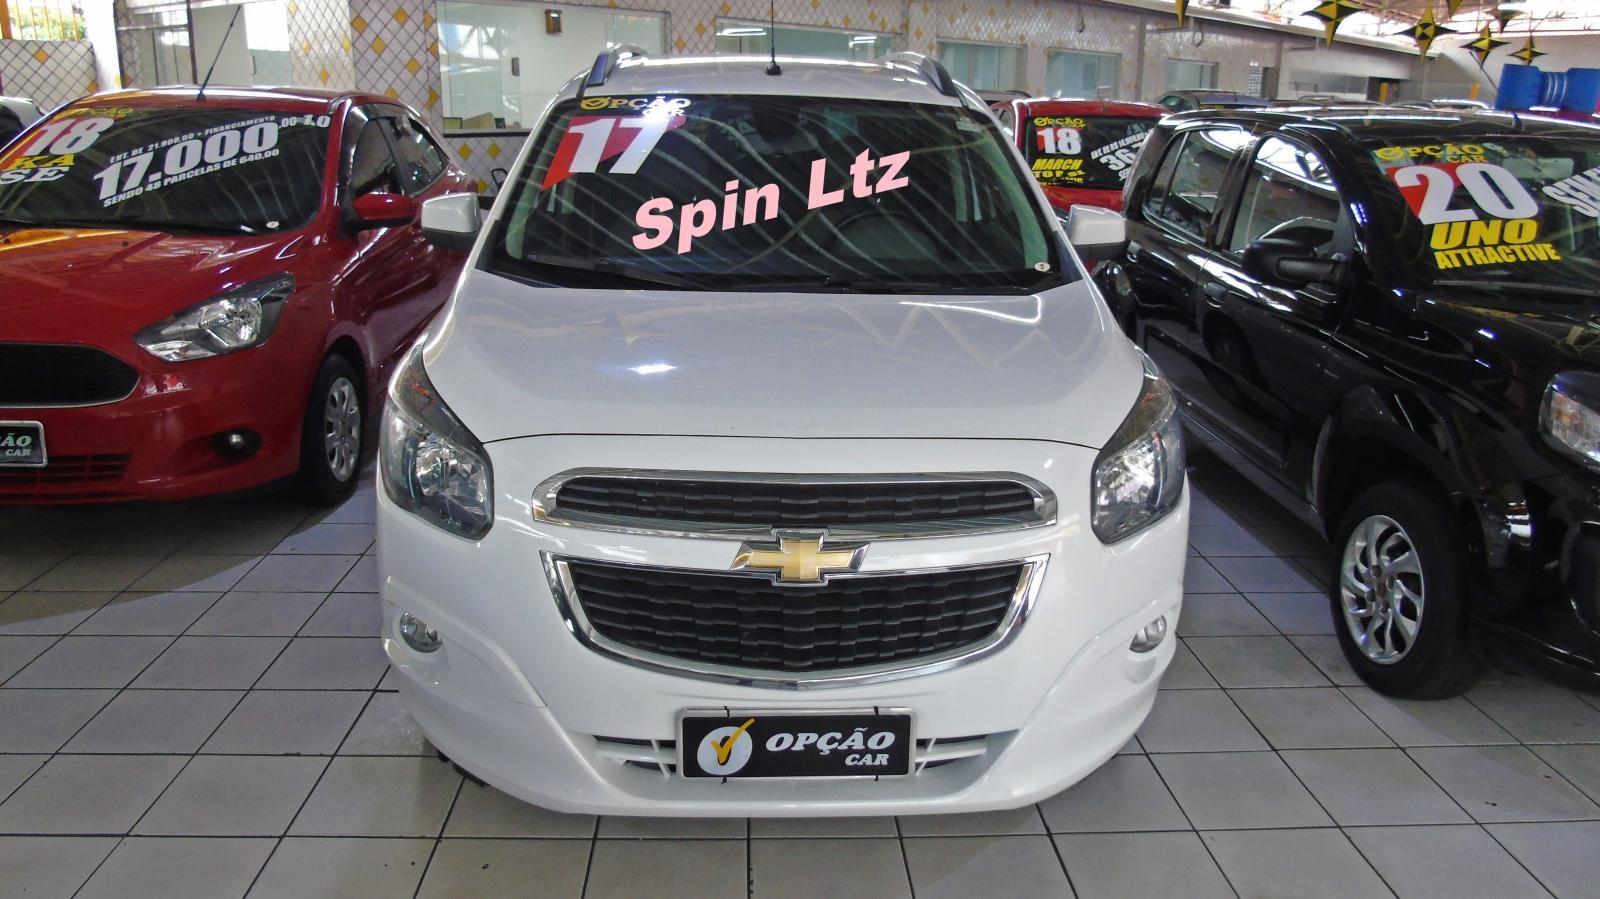 //www.autoline.com.br/carro/chevrolet/spin-18-ltz-7l-8v-flex-4p-manual/2017/sao-paulo-sp/12307475